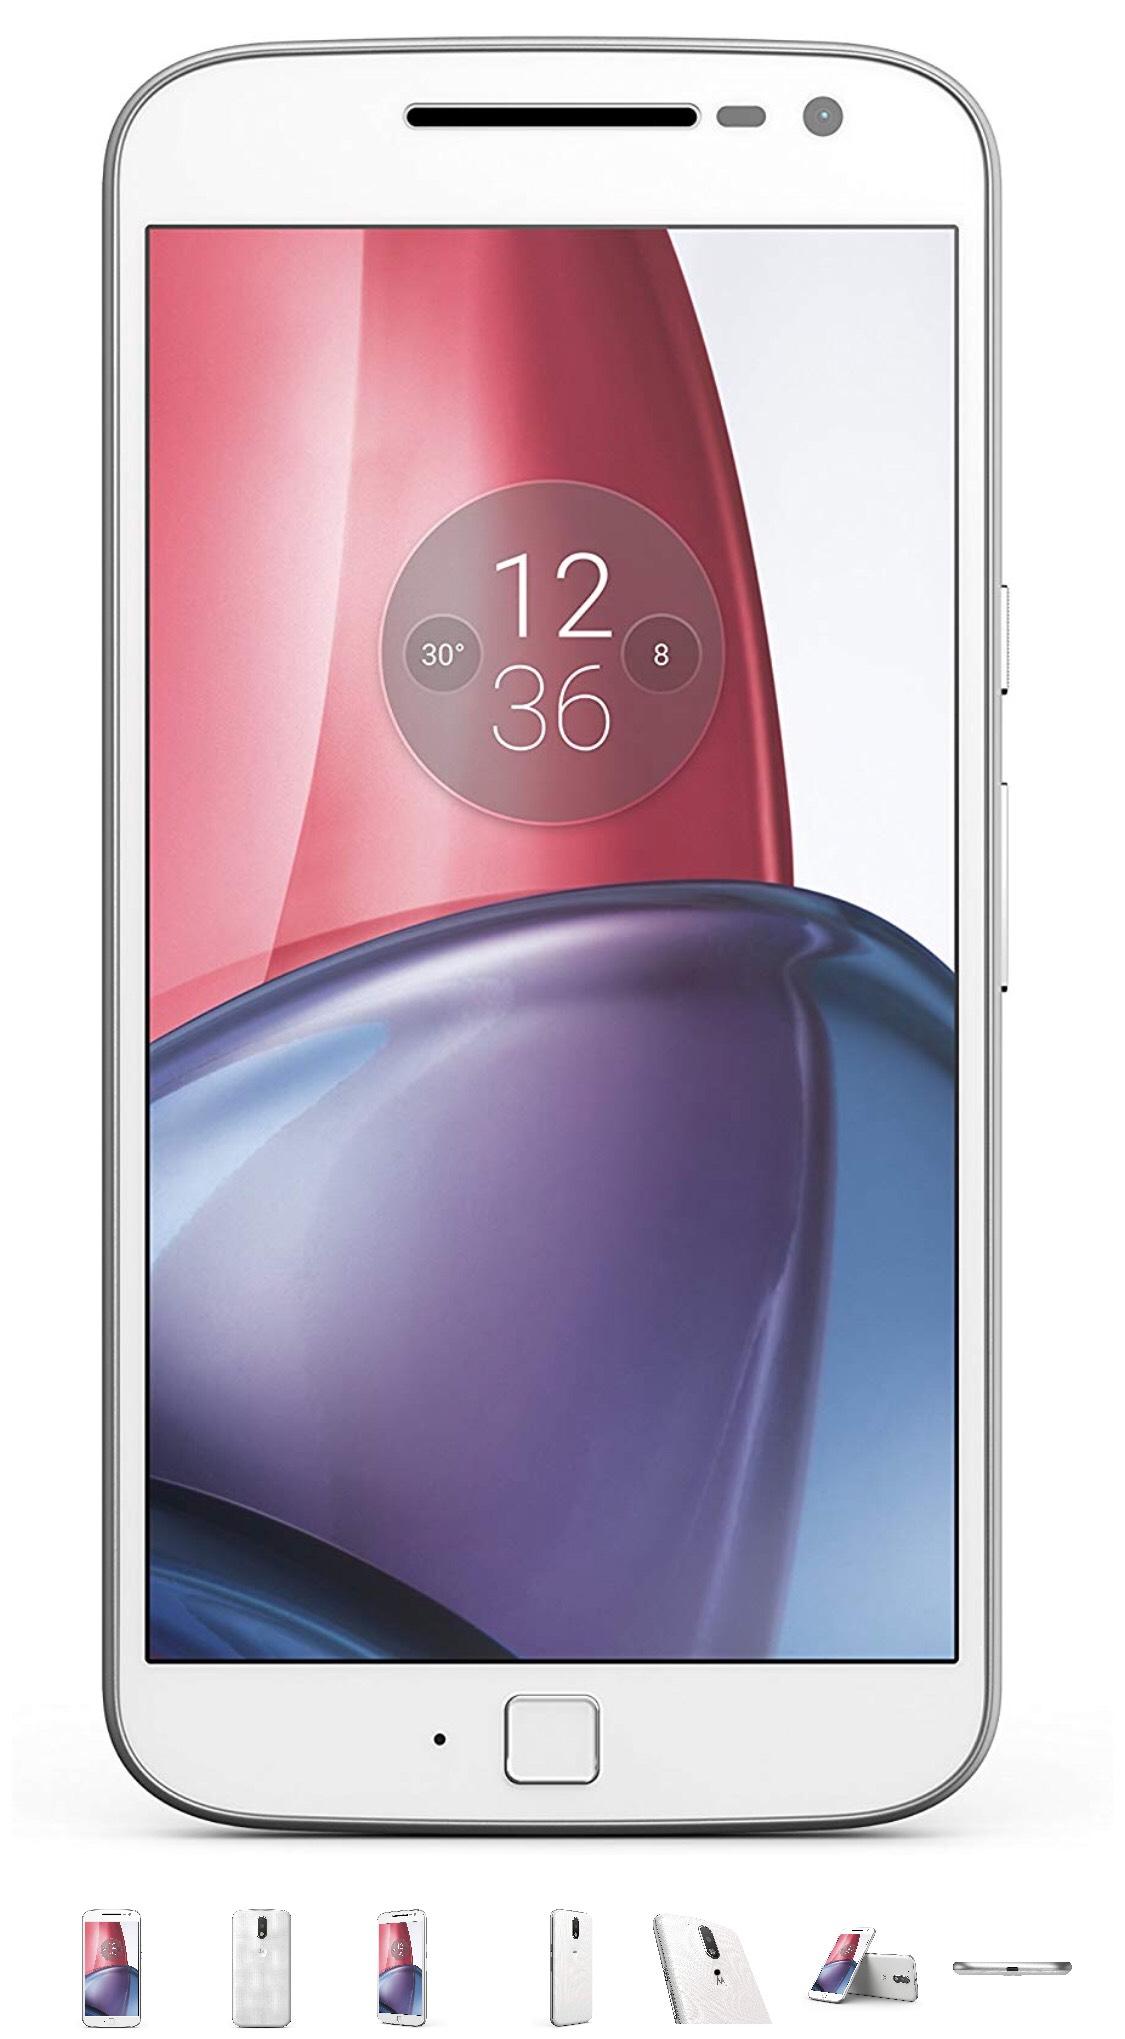 Motorola Moto G4 Plus 16GB (Dual Sim) £114.99 Amazon